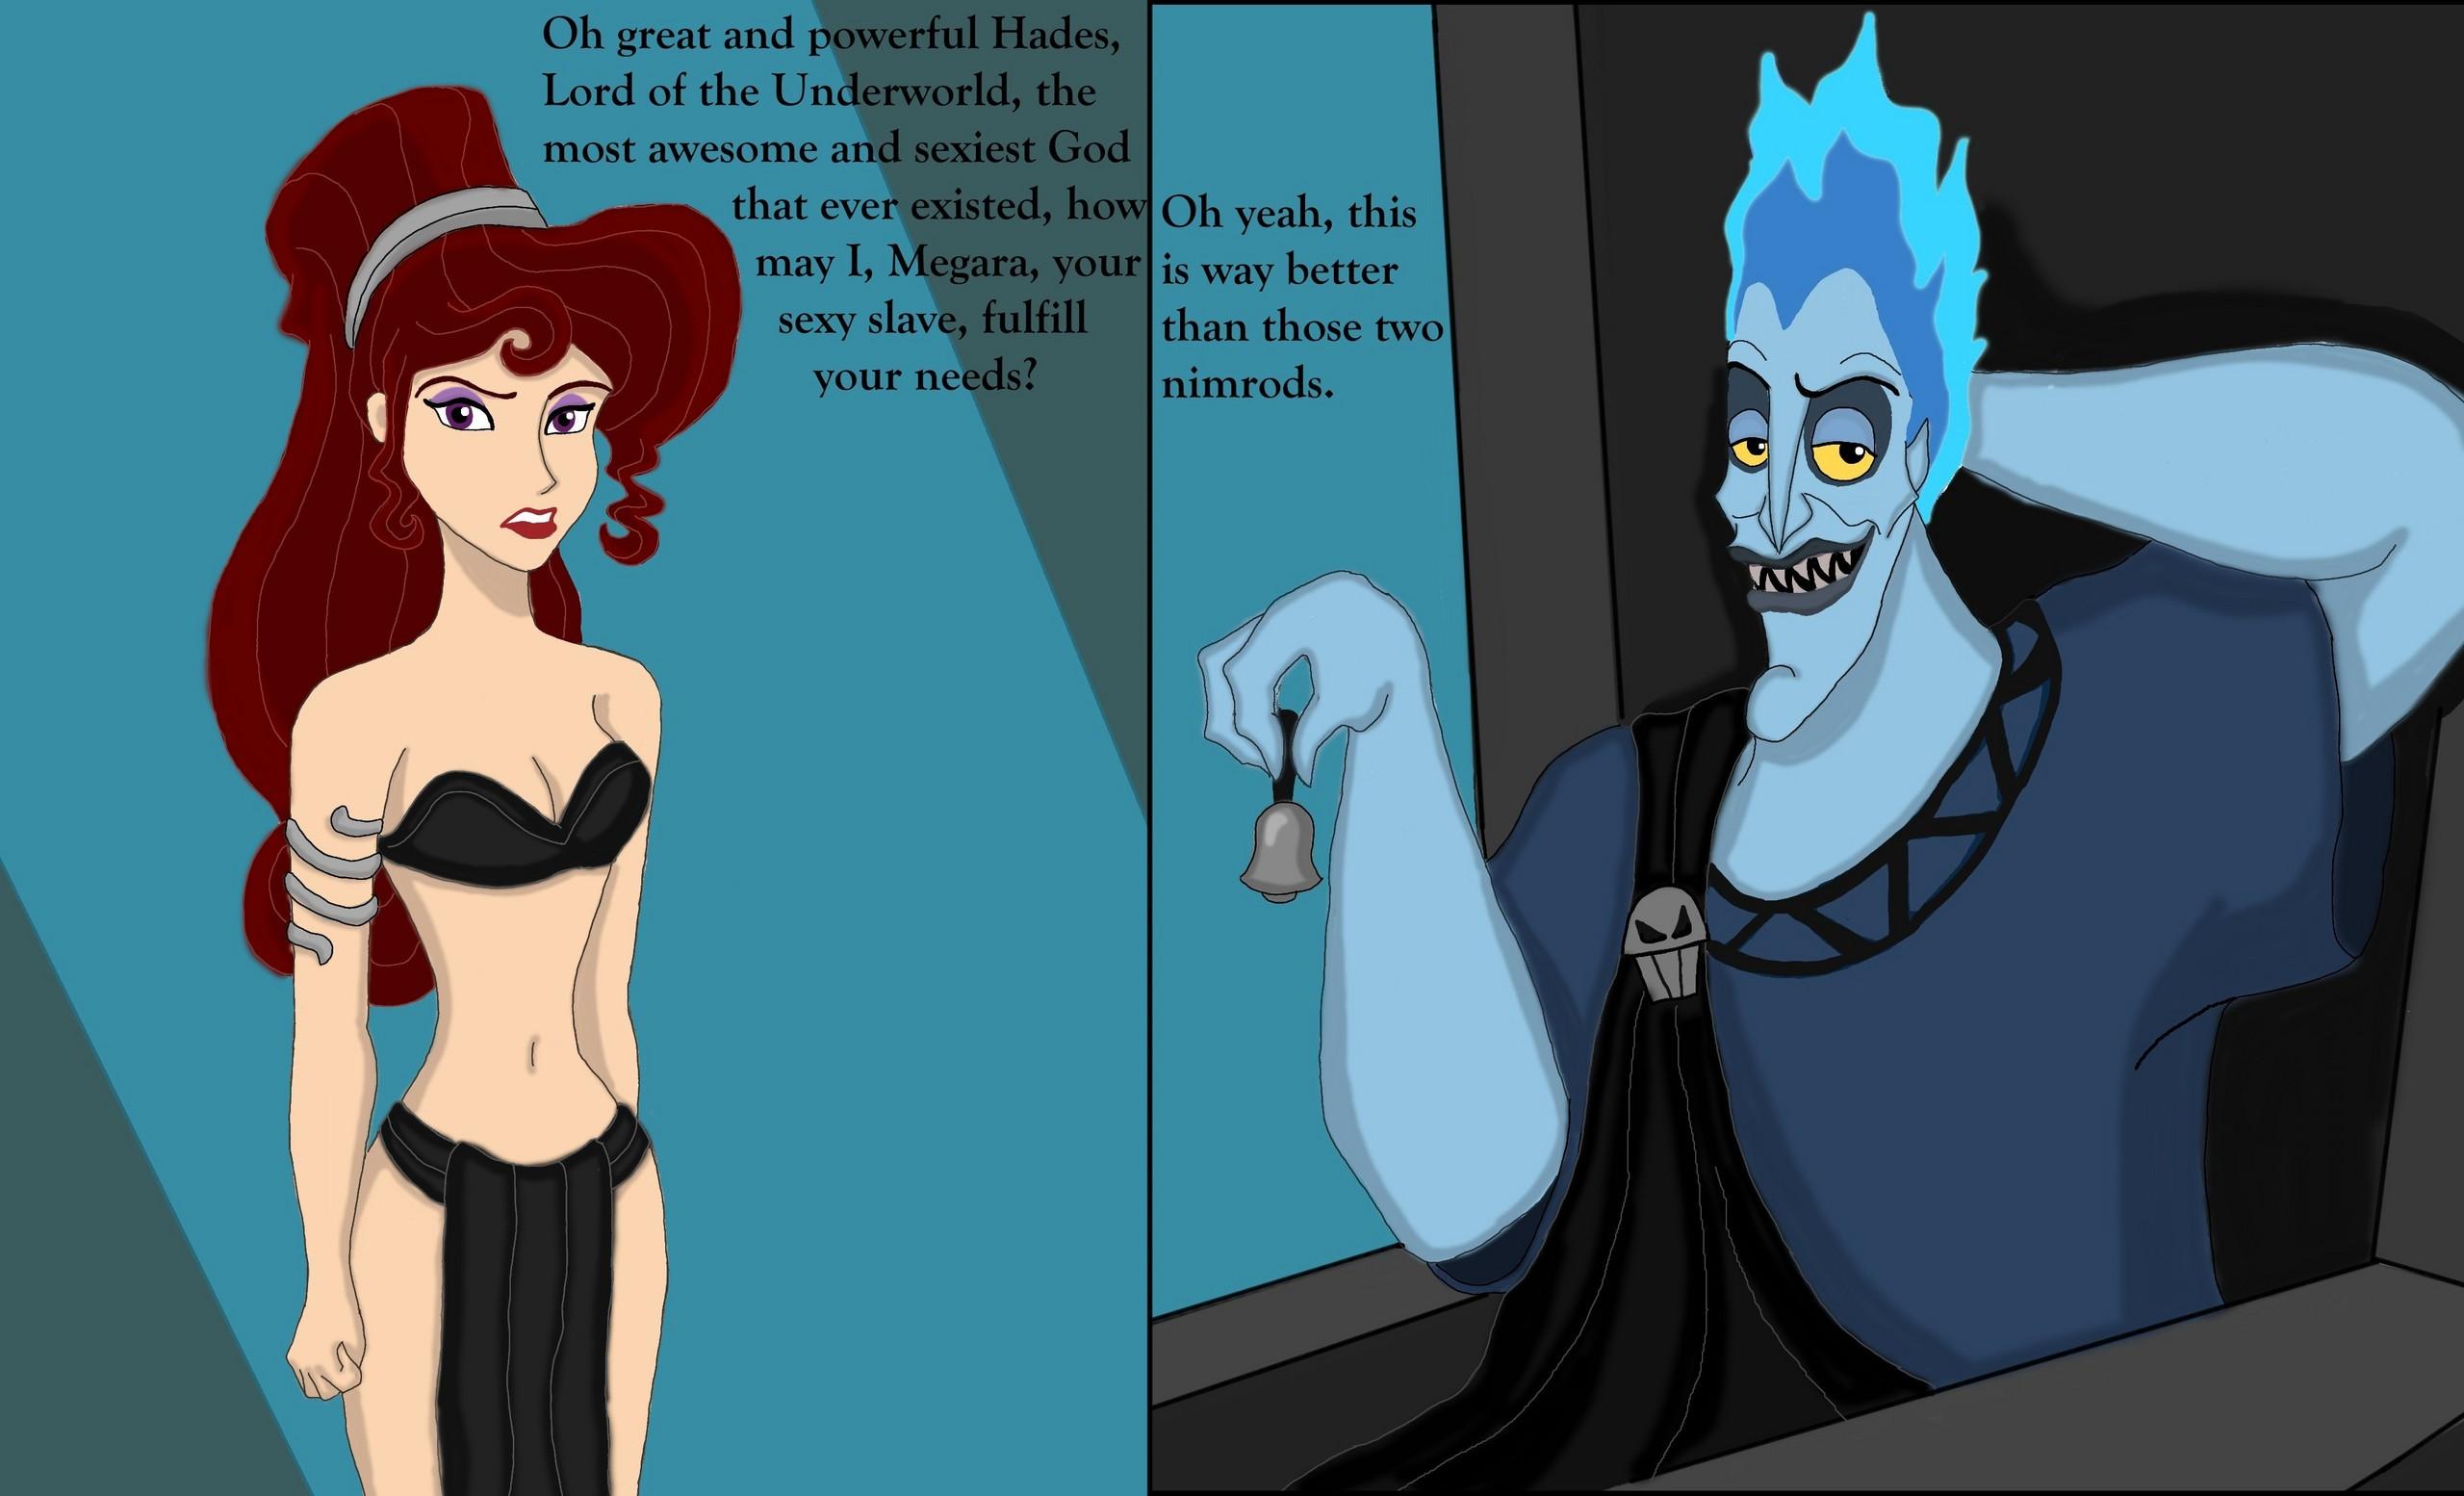 Funny Hades/Meg